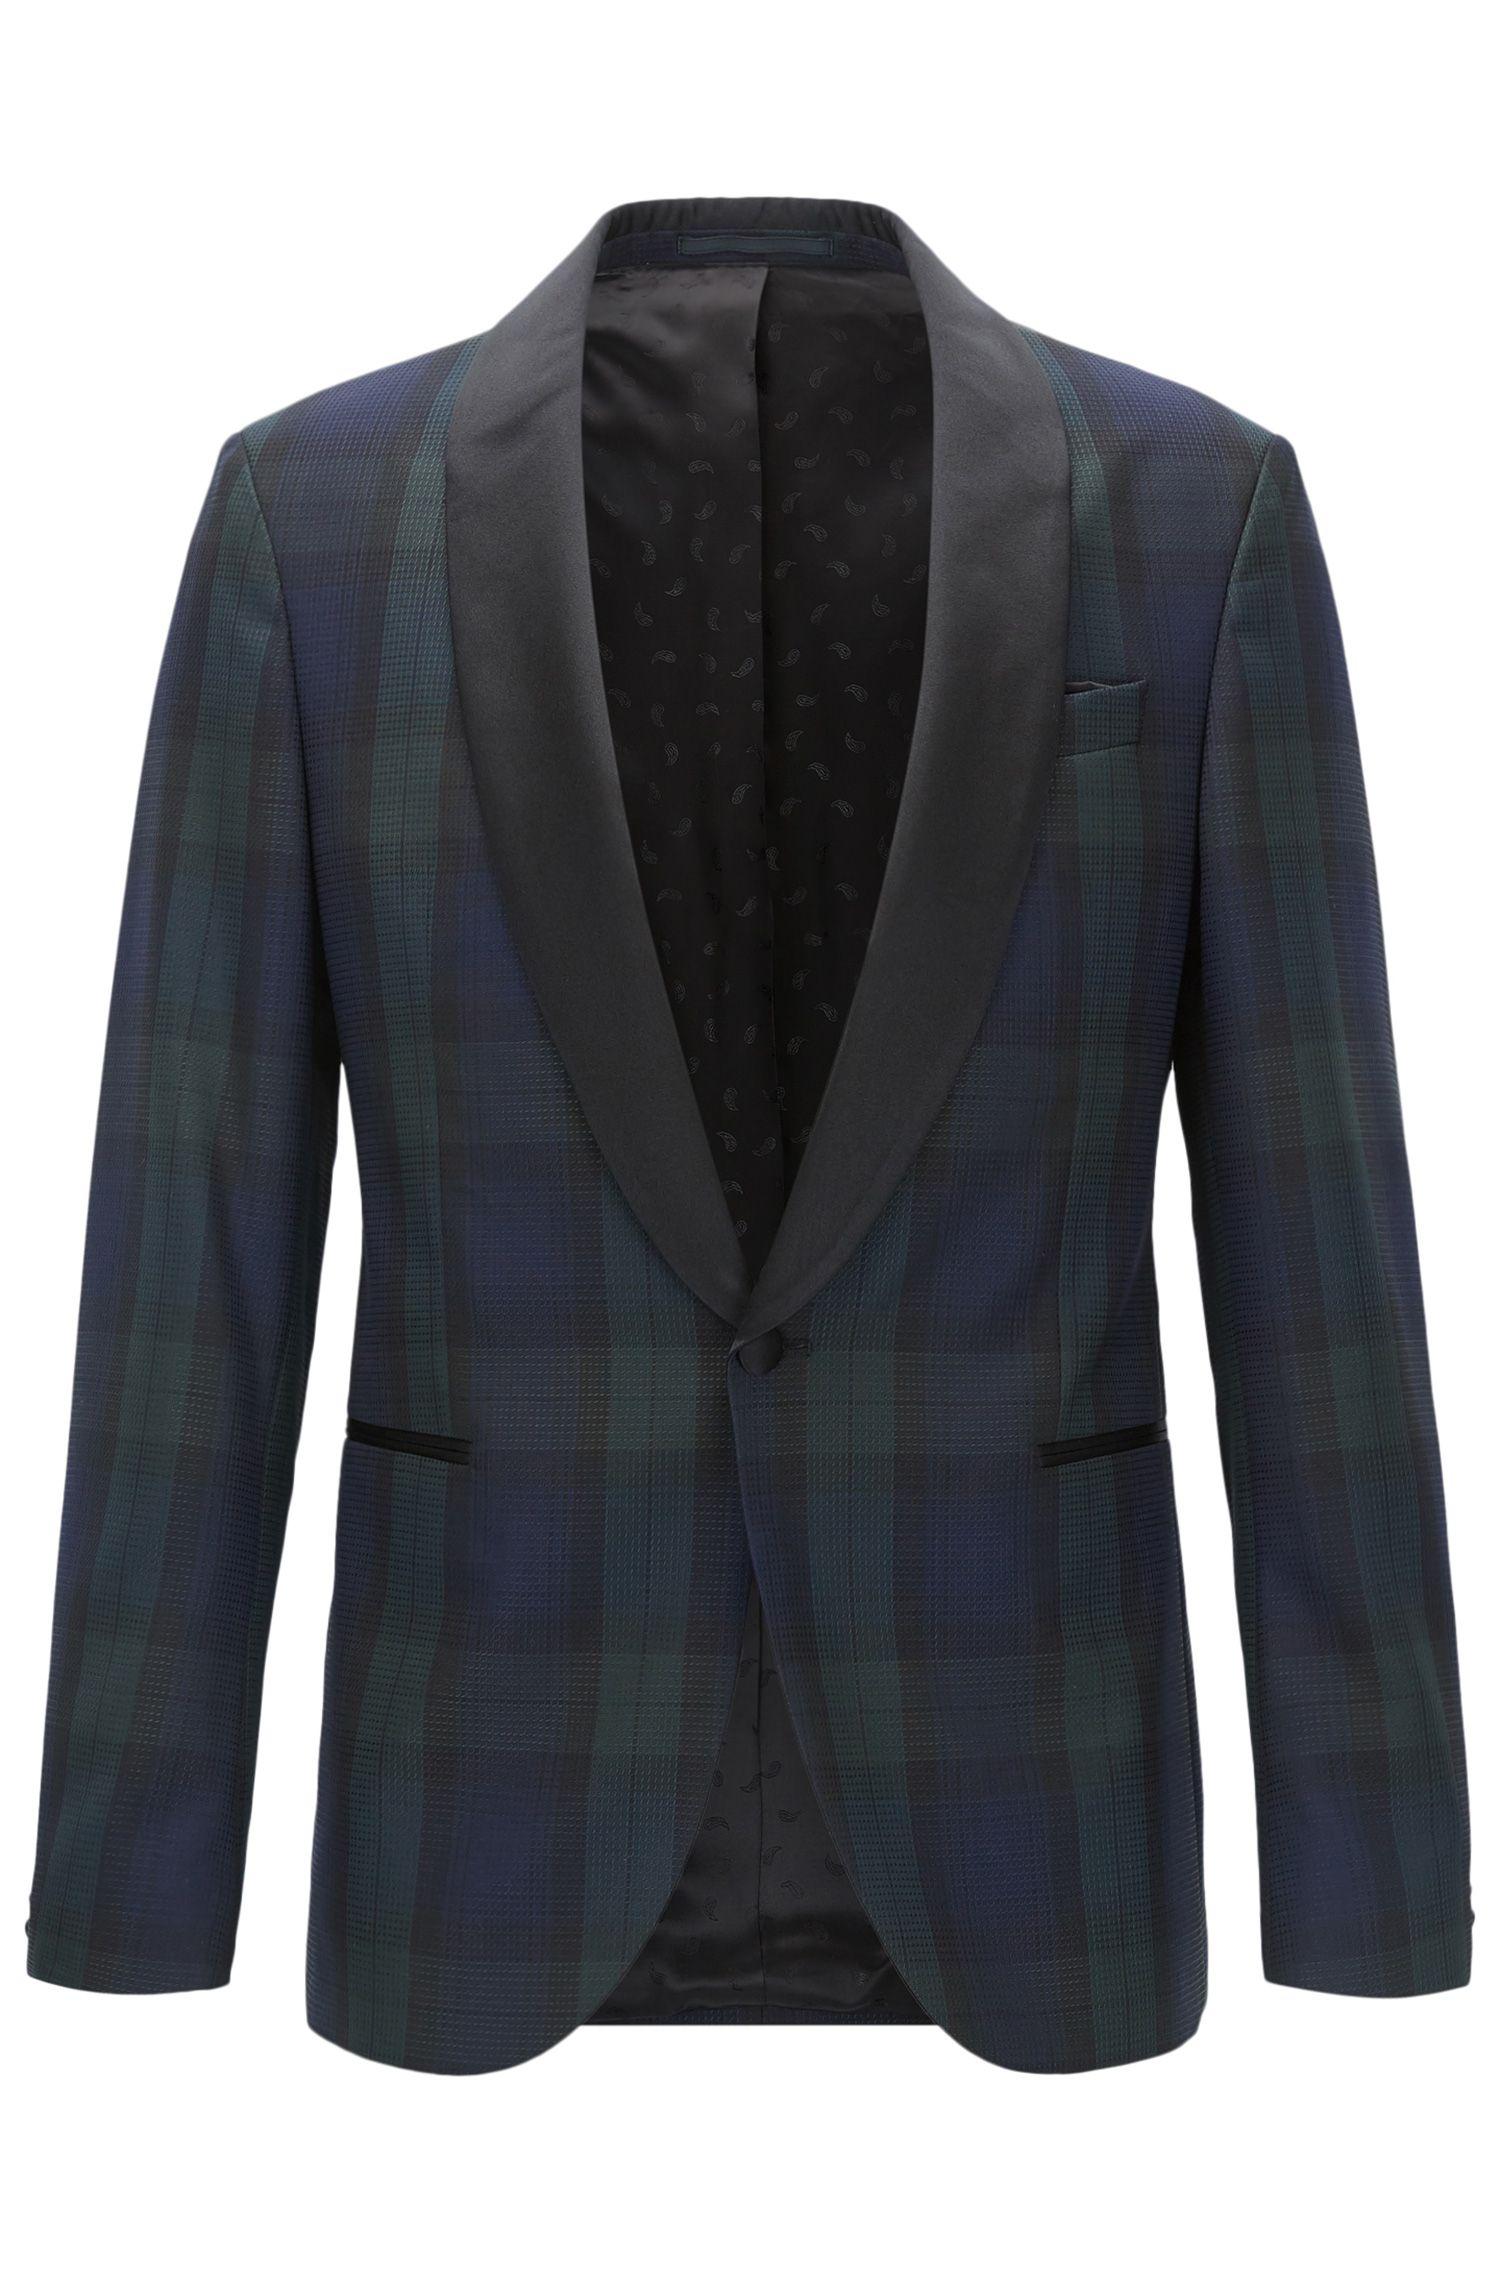 Black Watch Plaid Wool Evening Jacket, Slim Fit | Nemir